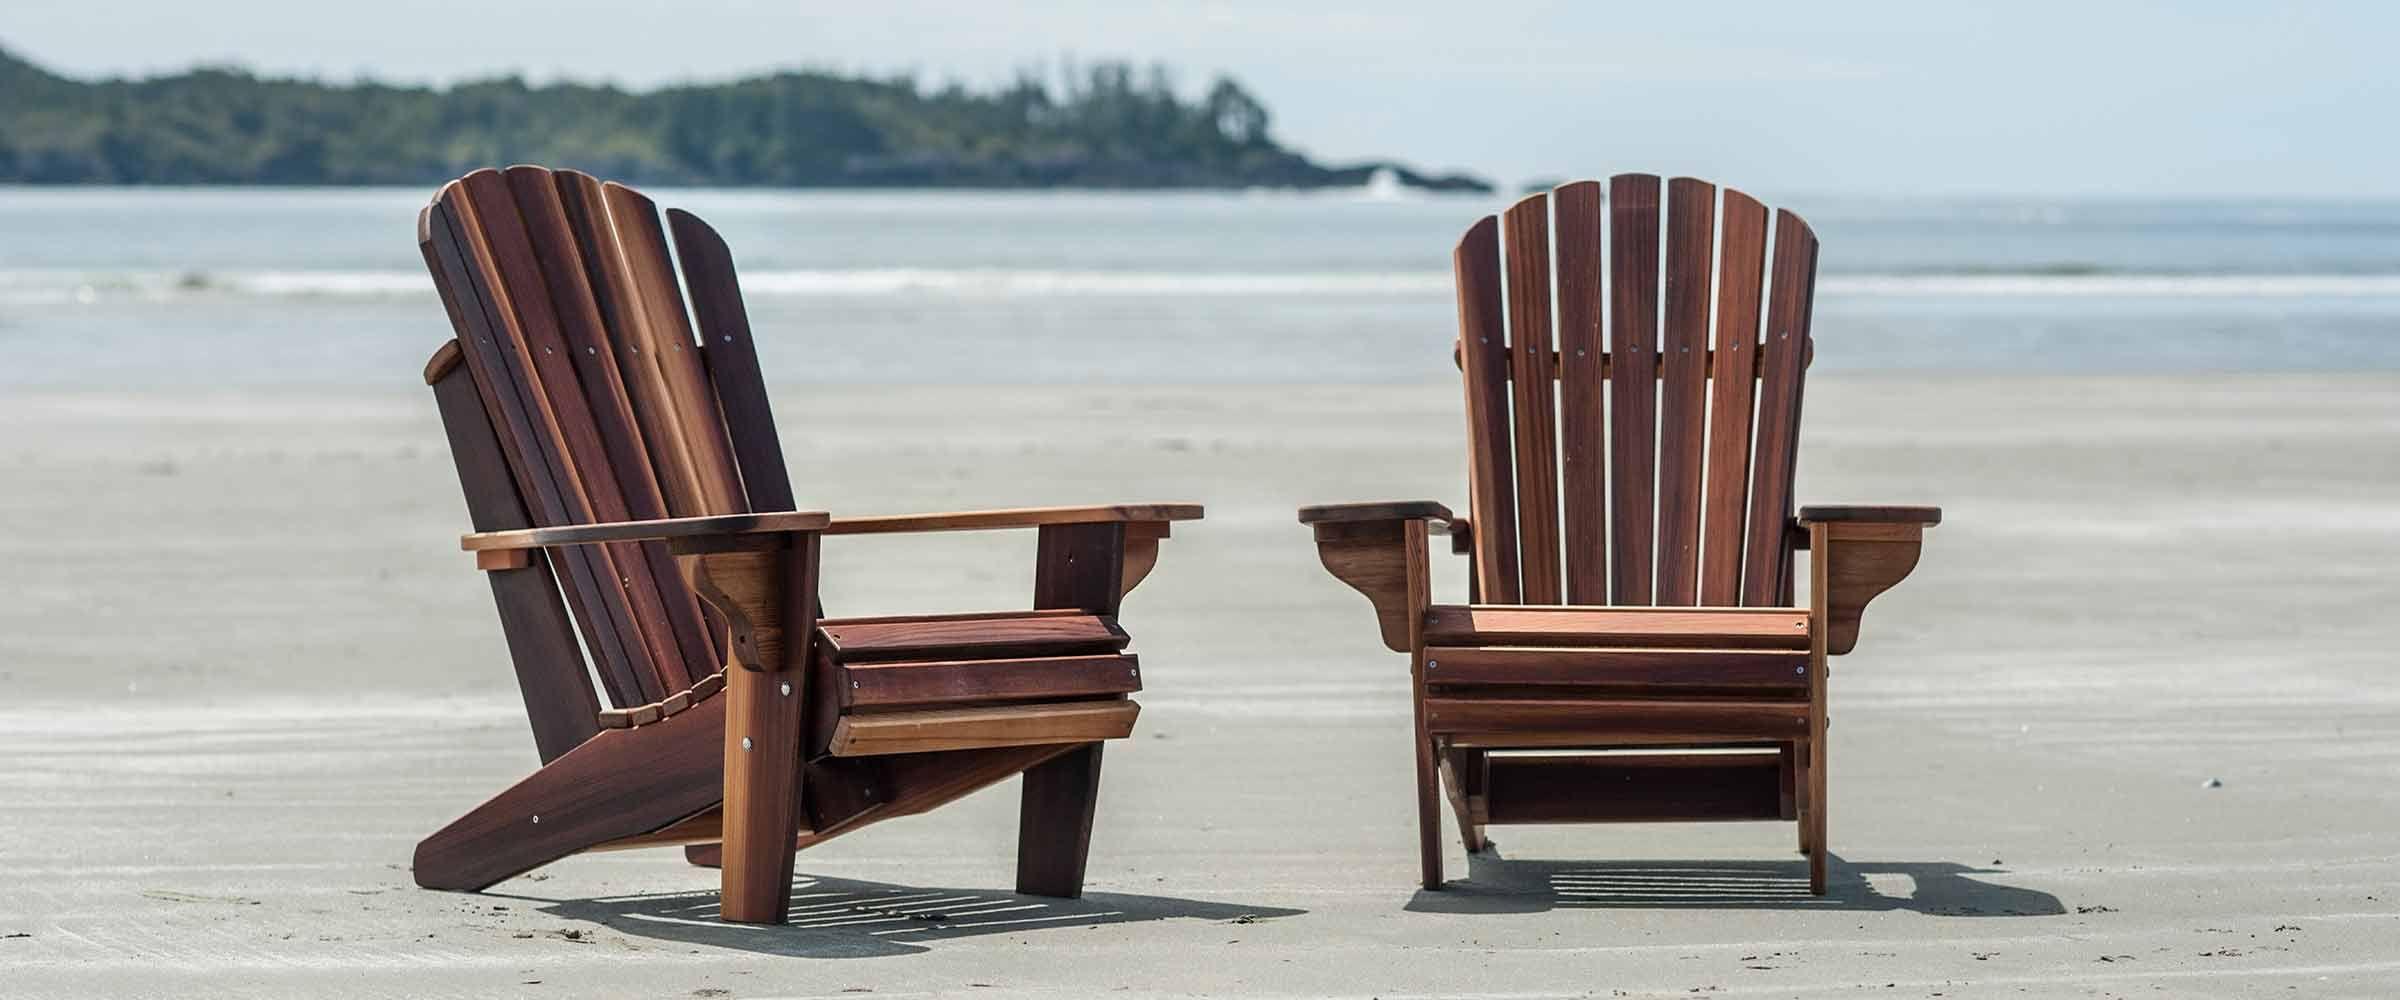 Wonderful Adirondack Cedar Chairs From Tofino Cedar Furniture For The Back Yard